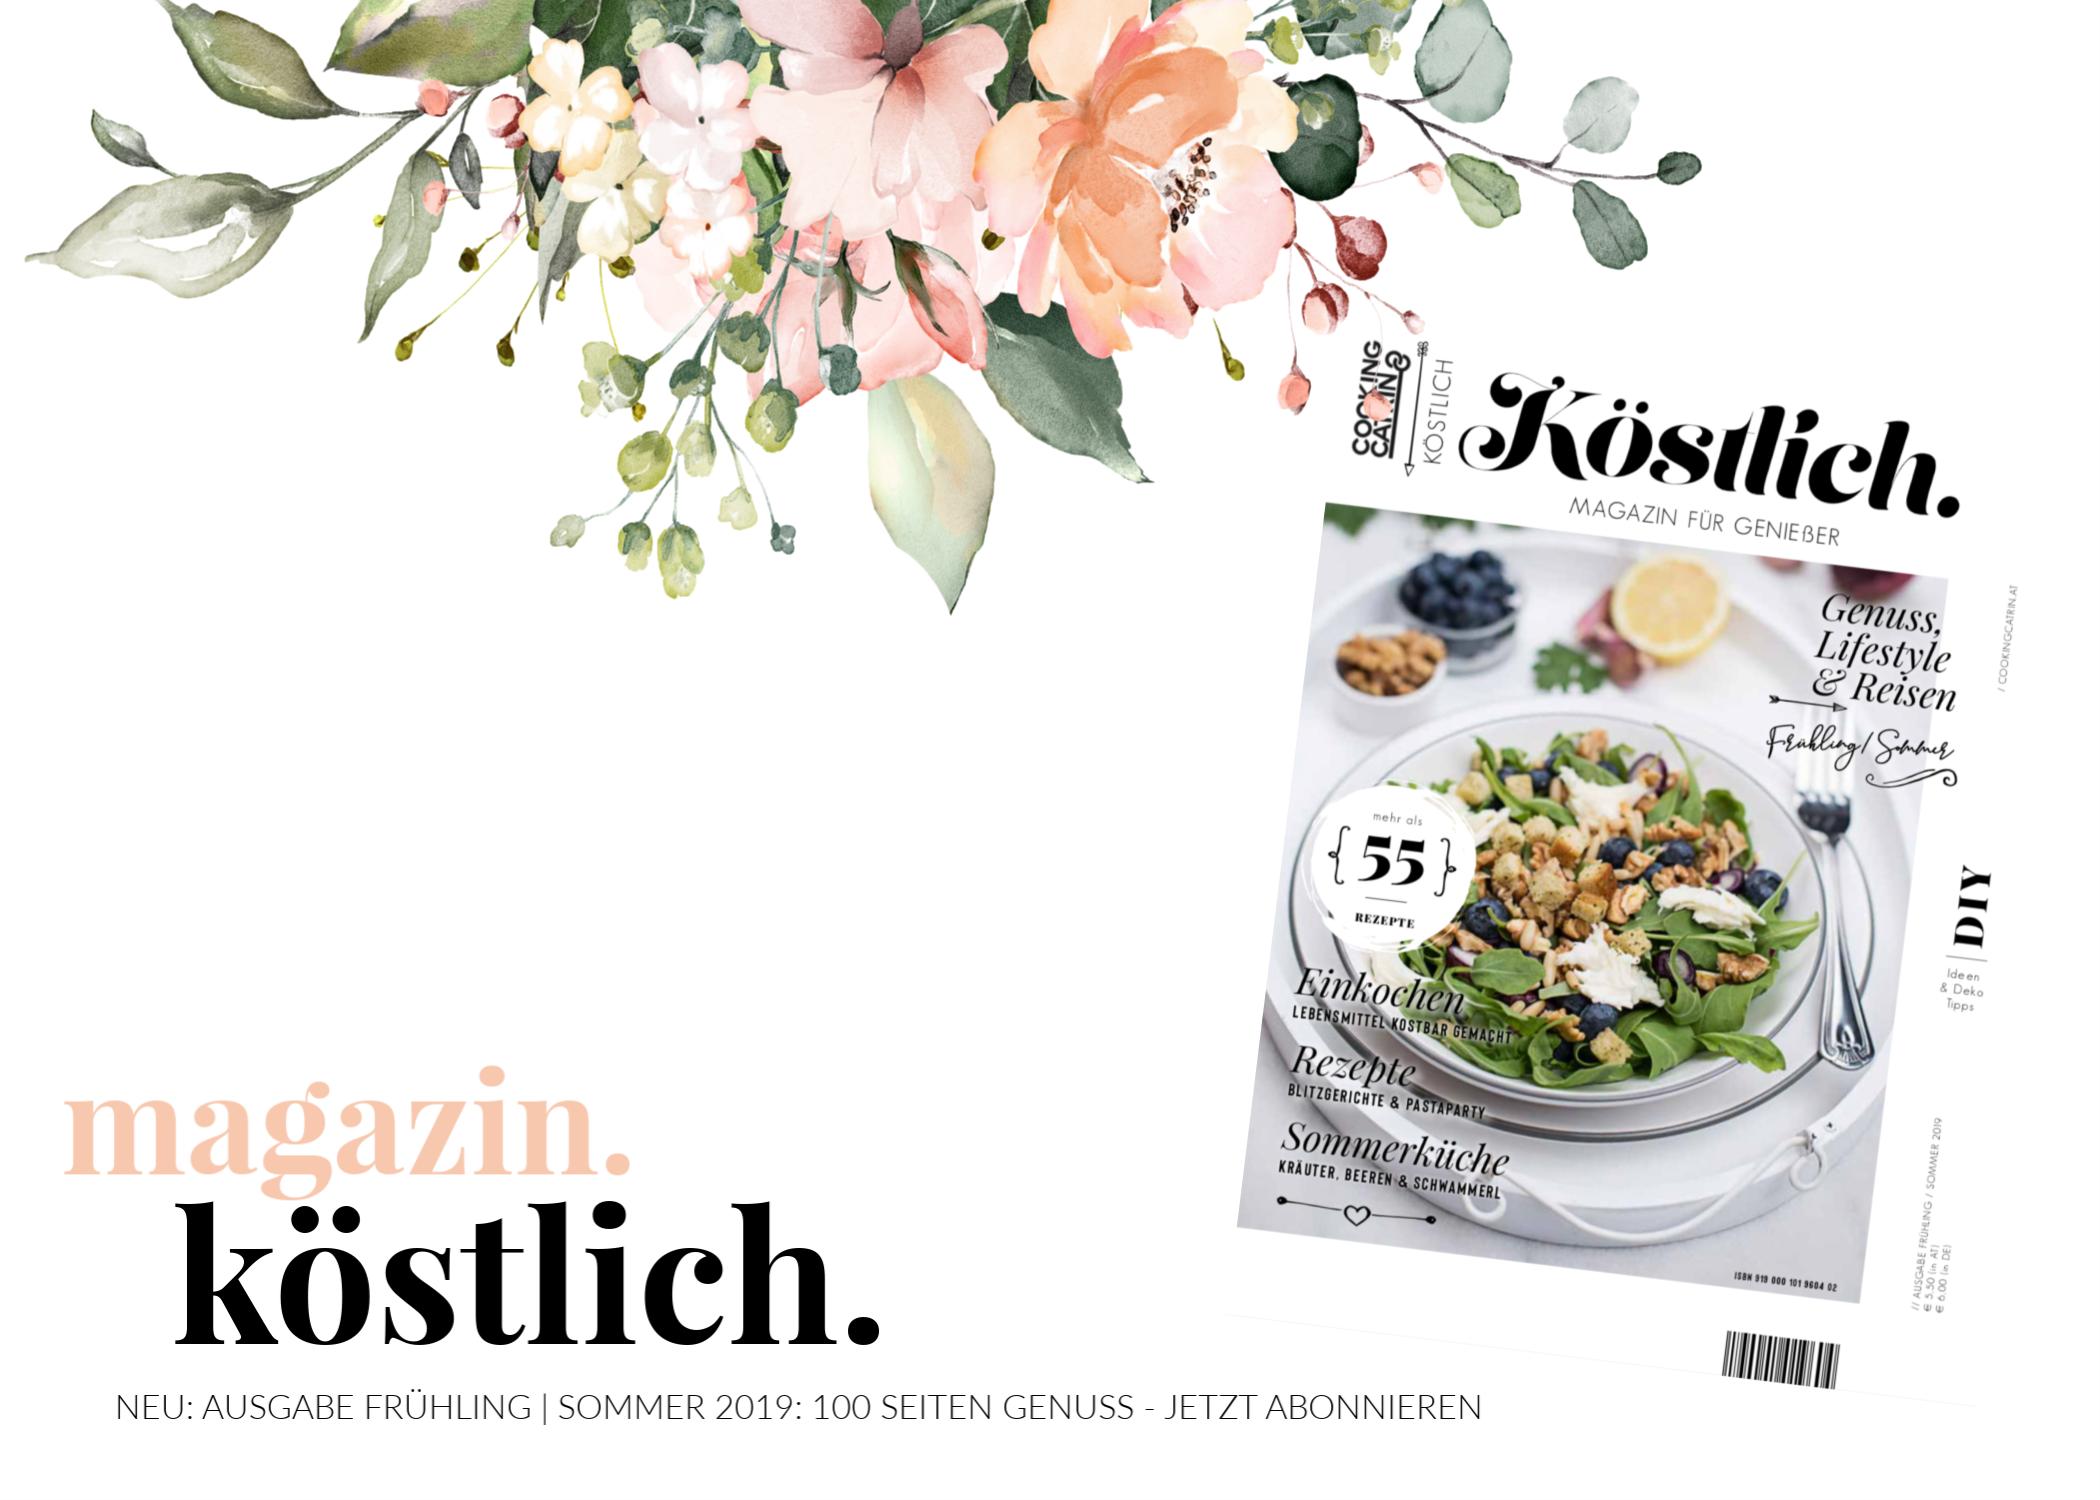 Köstlich Magazin, Magazin cookingCatrin, Köstlich Magazin cookingCatrin